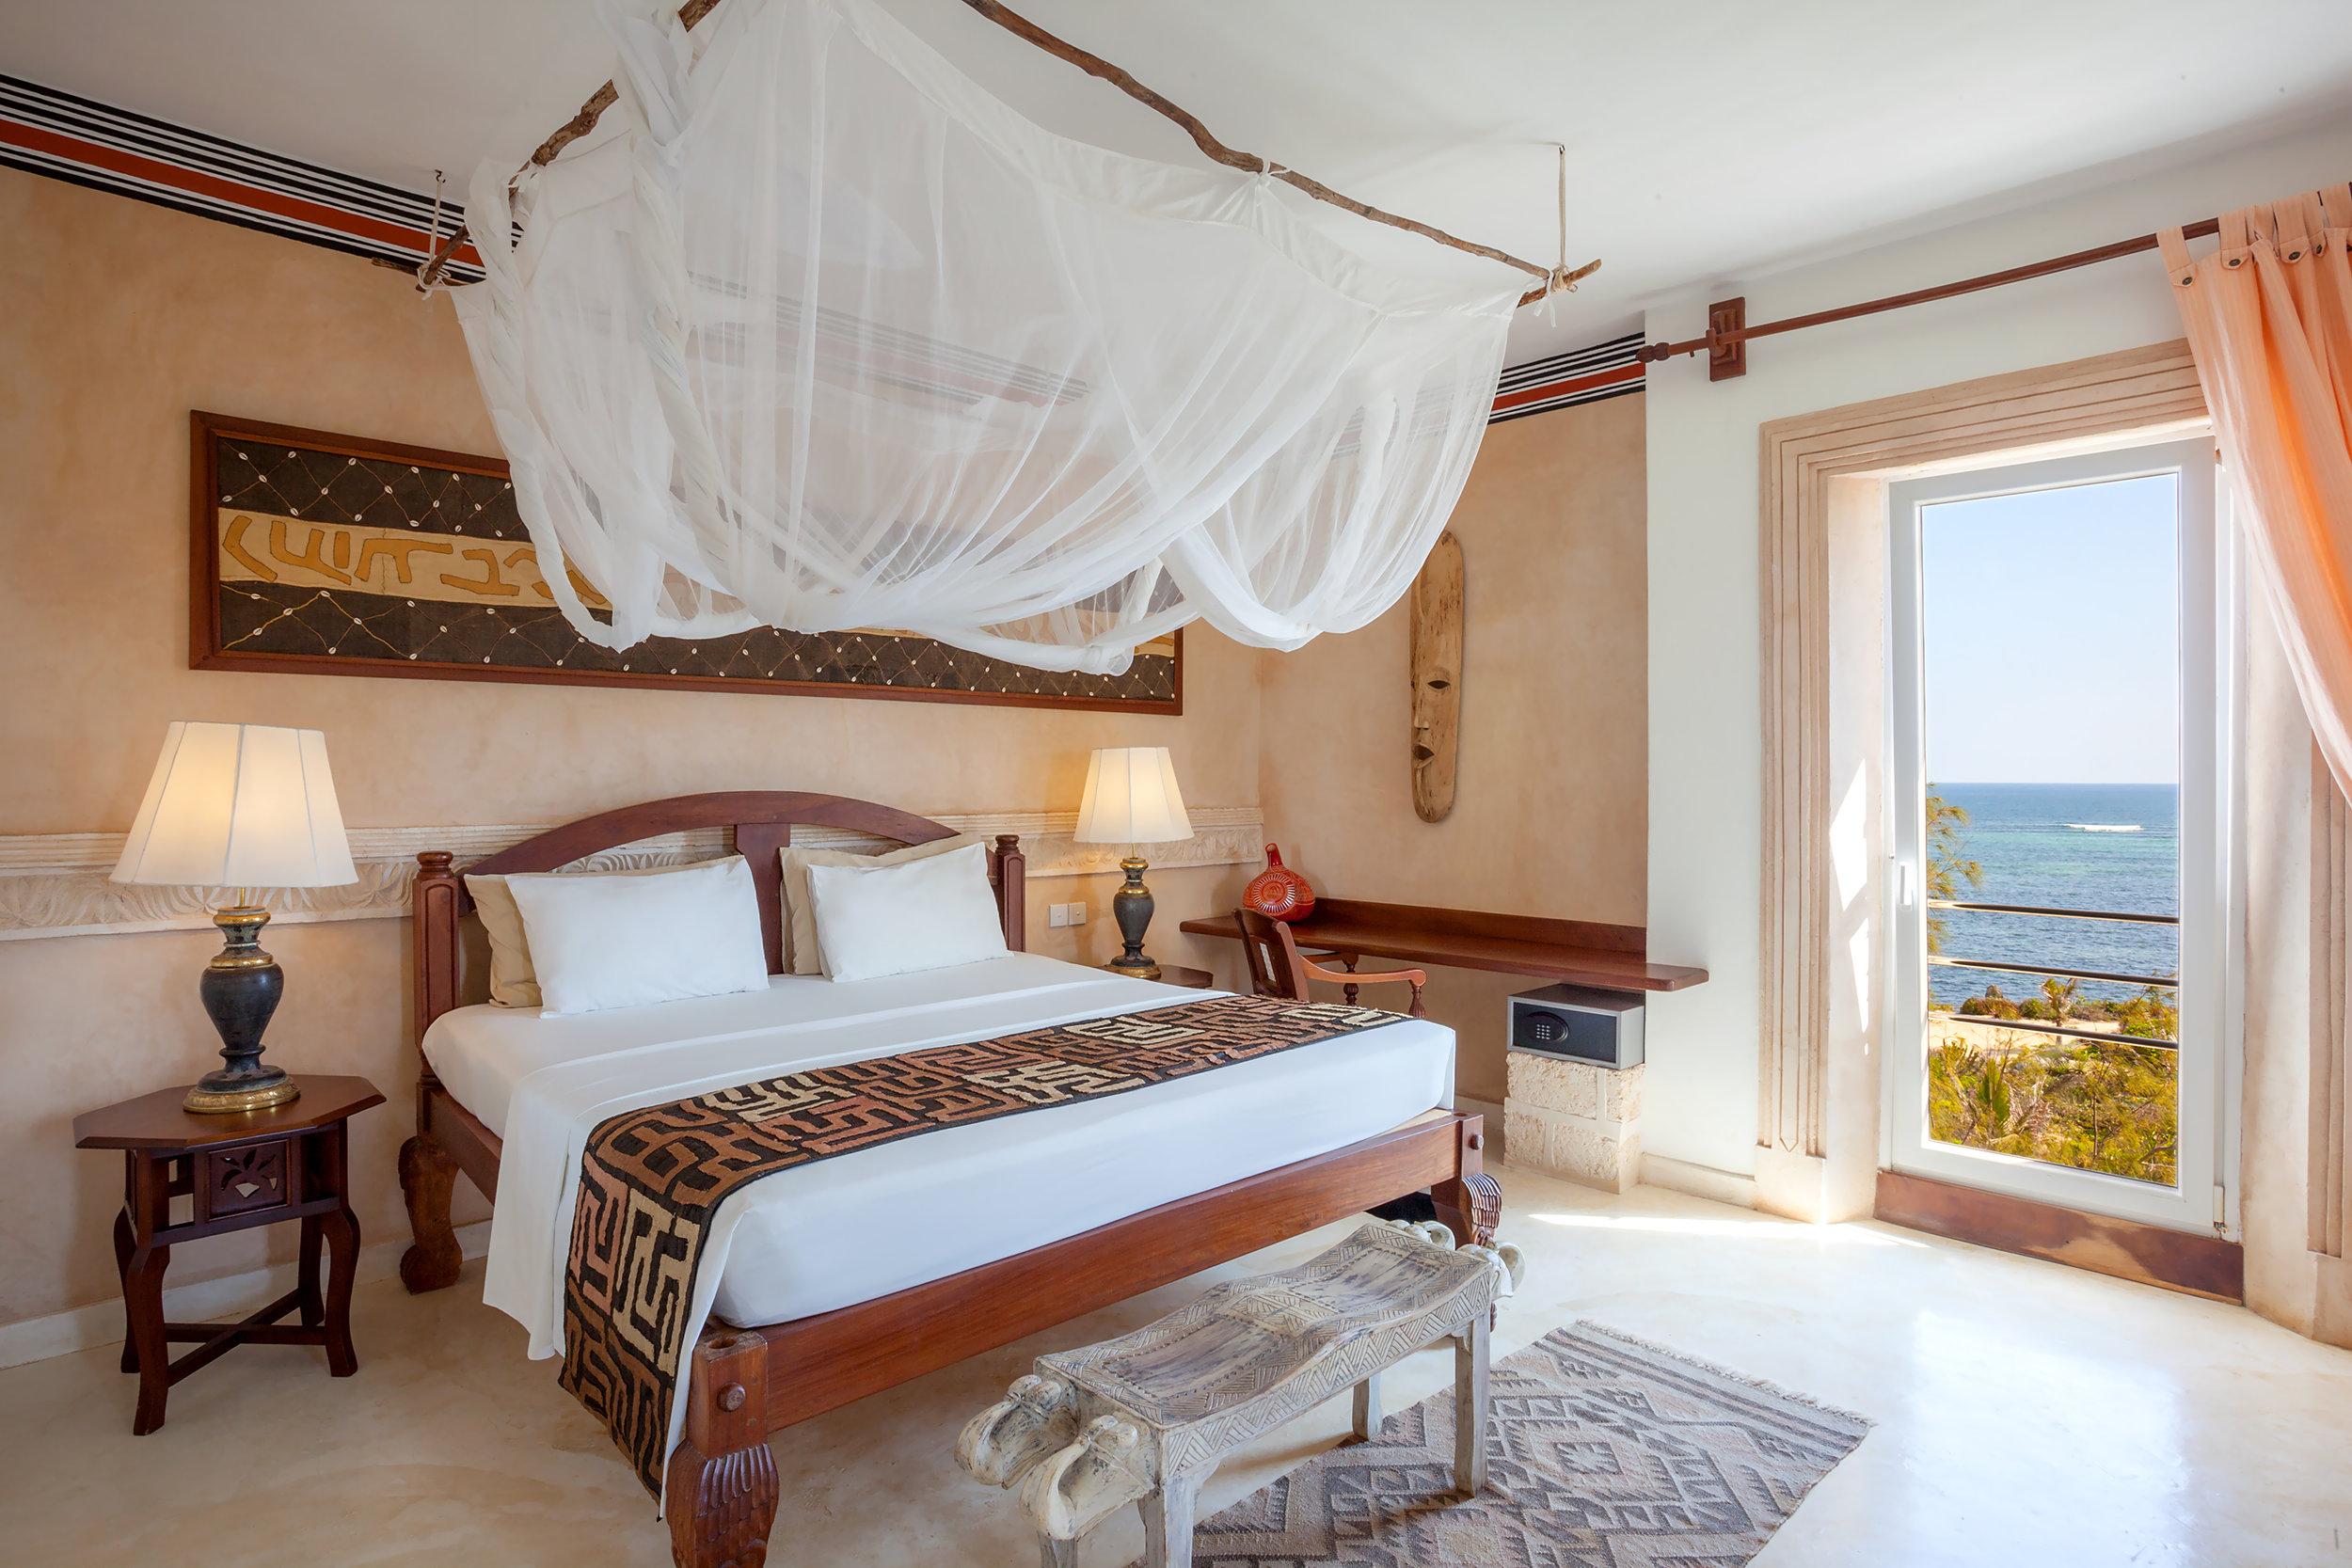 LUXURY hotelS & resortS -